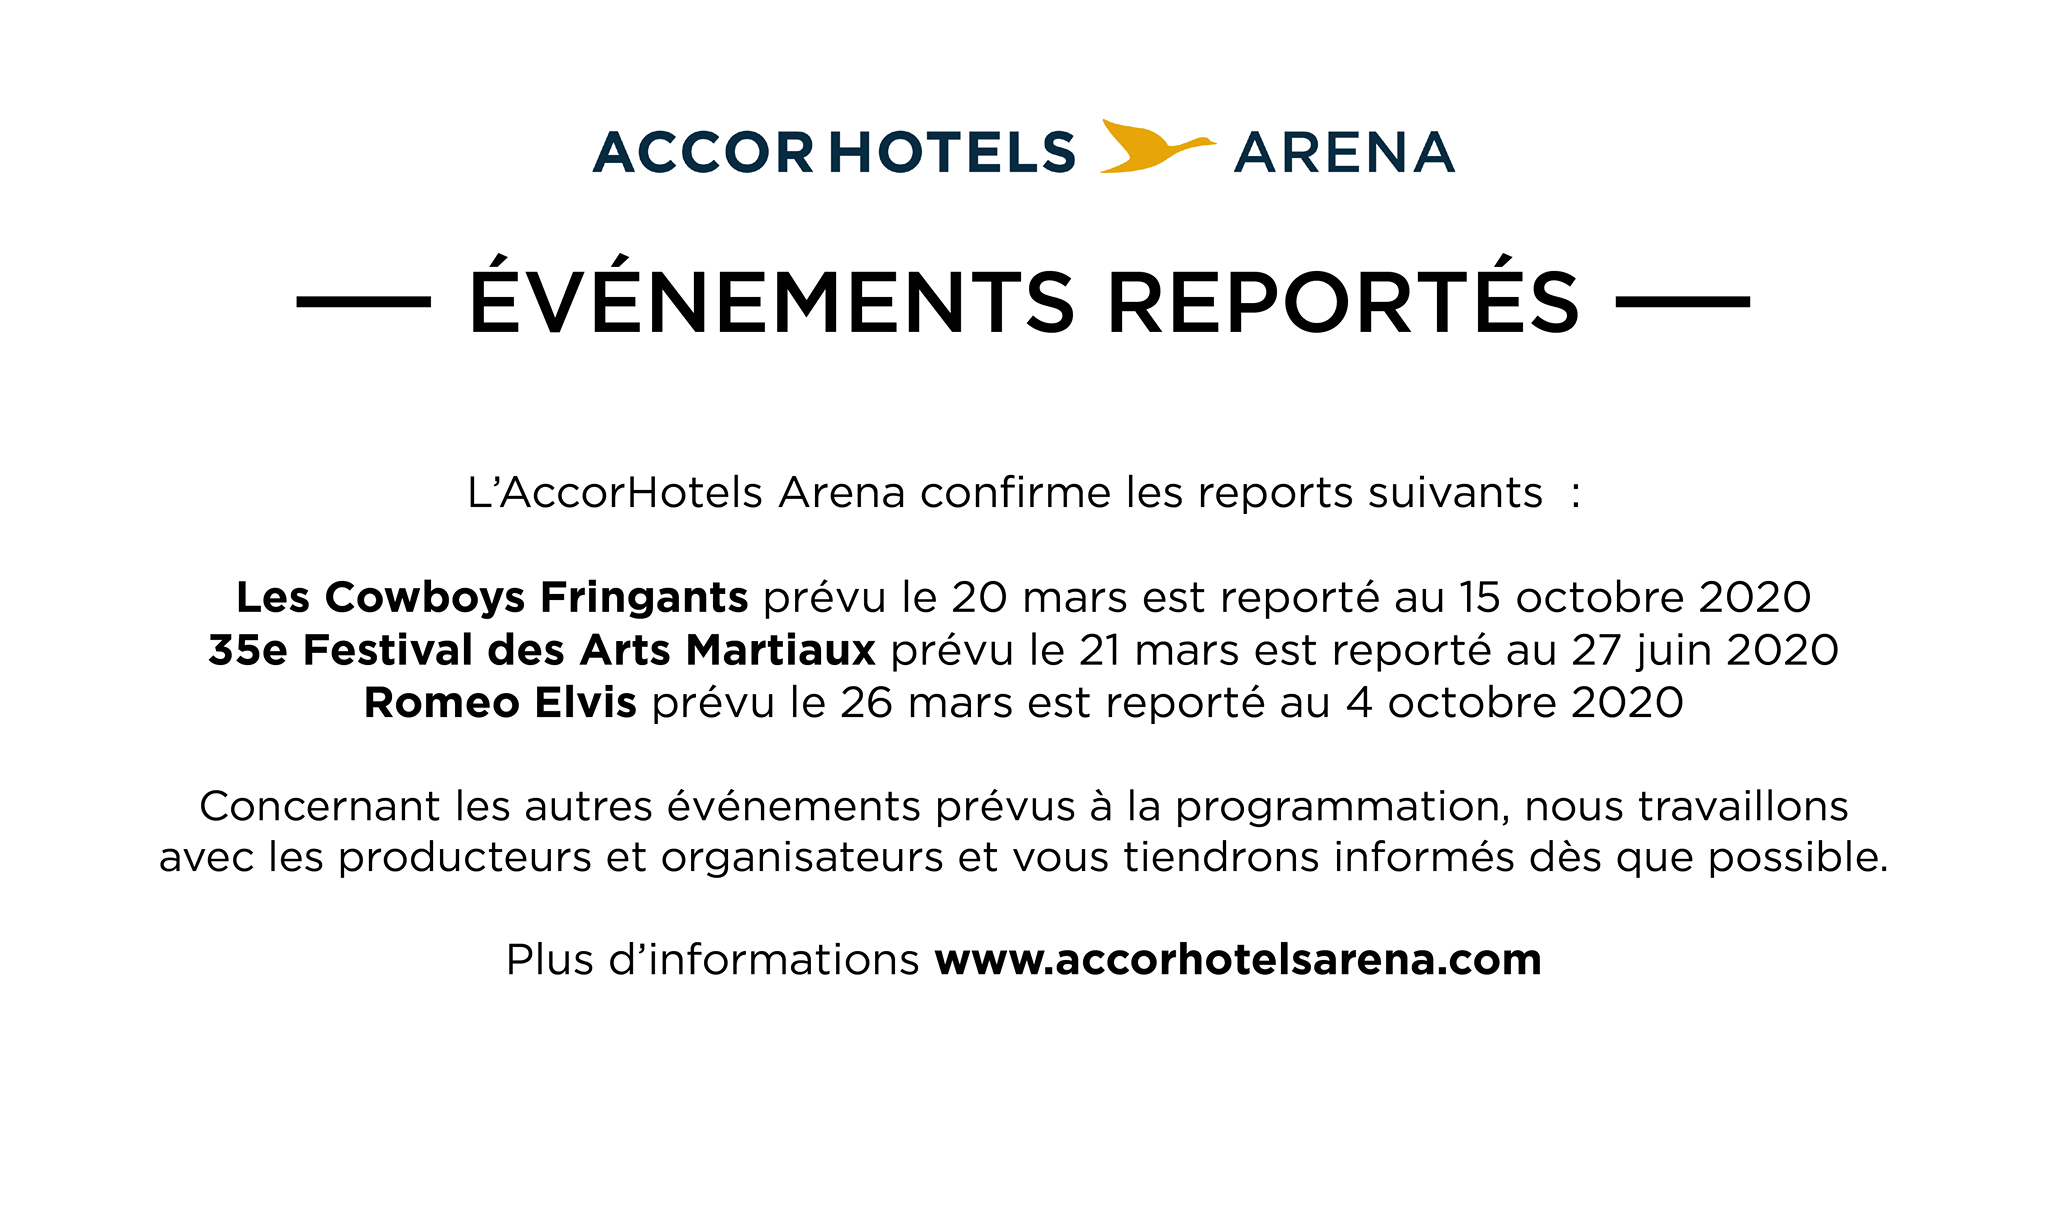 AccorHotels Arena - communiqué